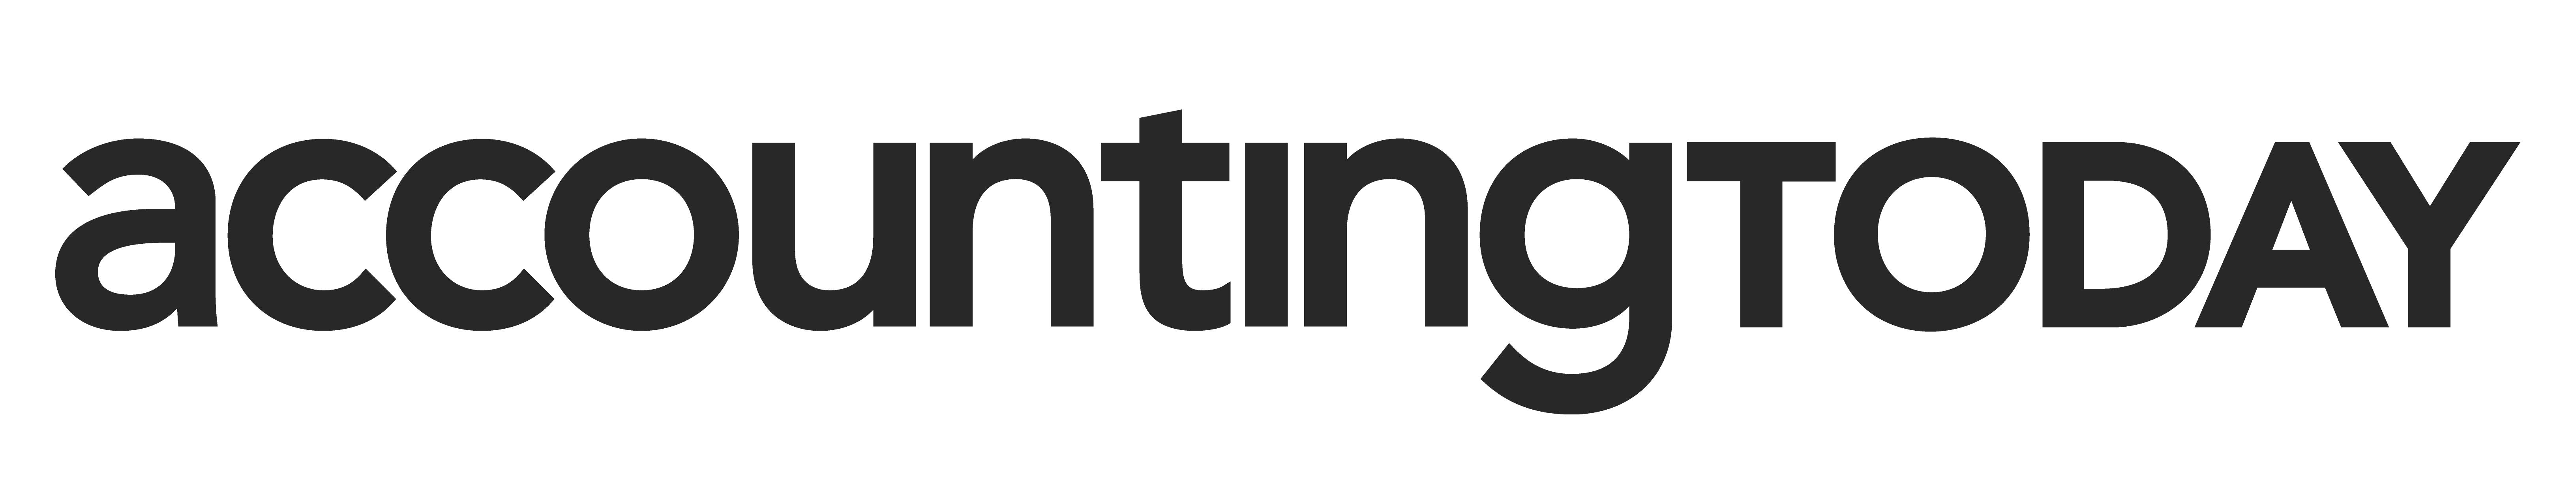 brand-accounting-today-white-01